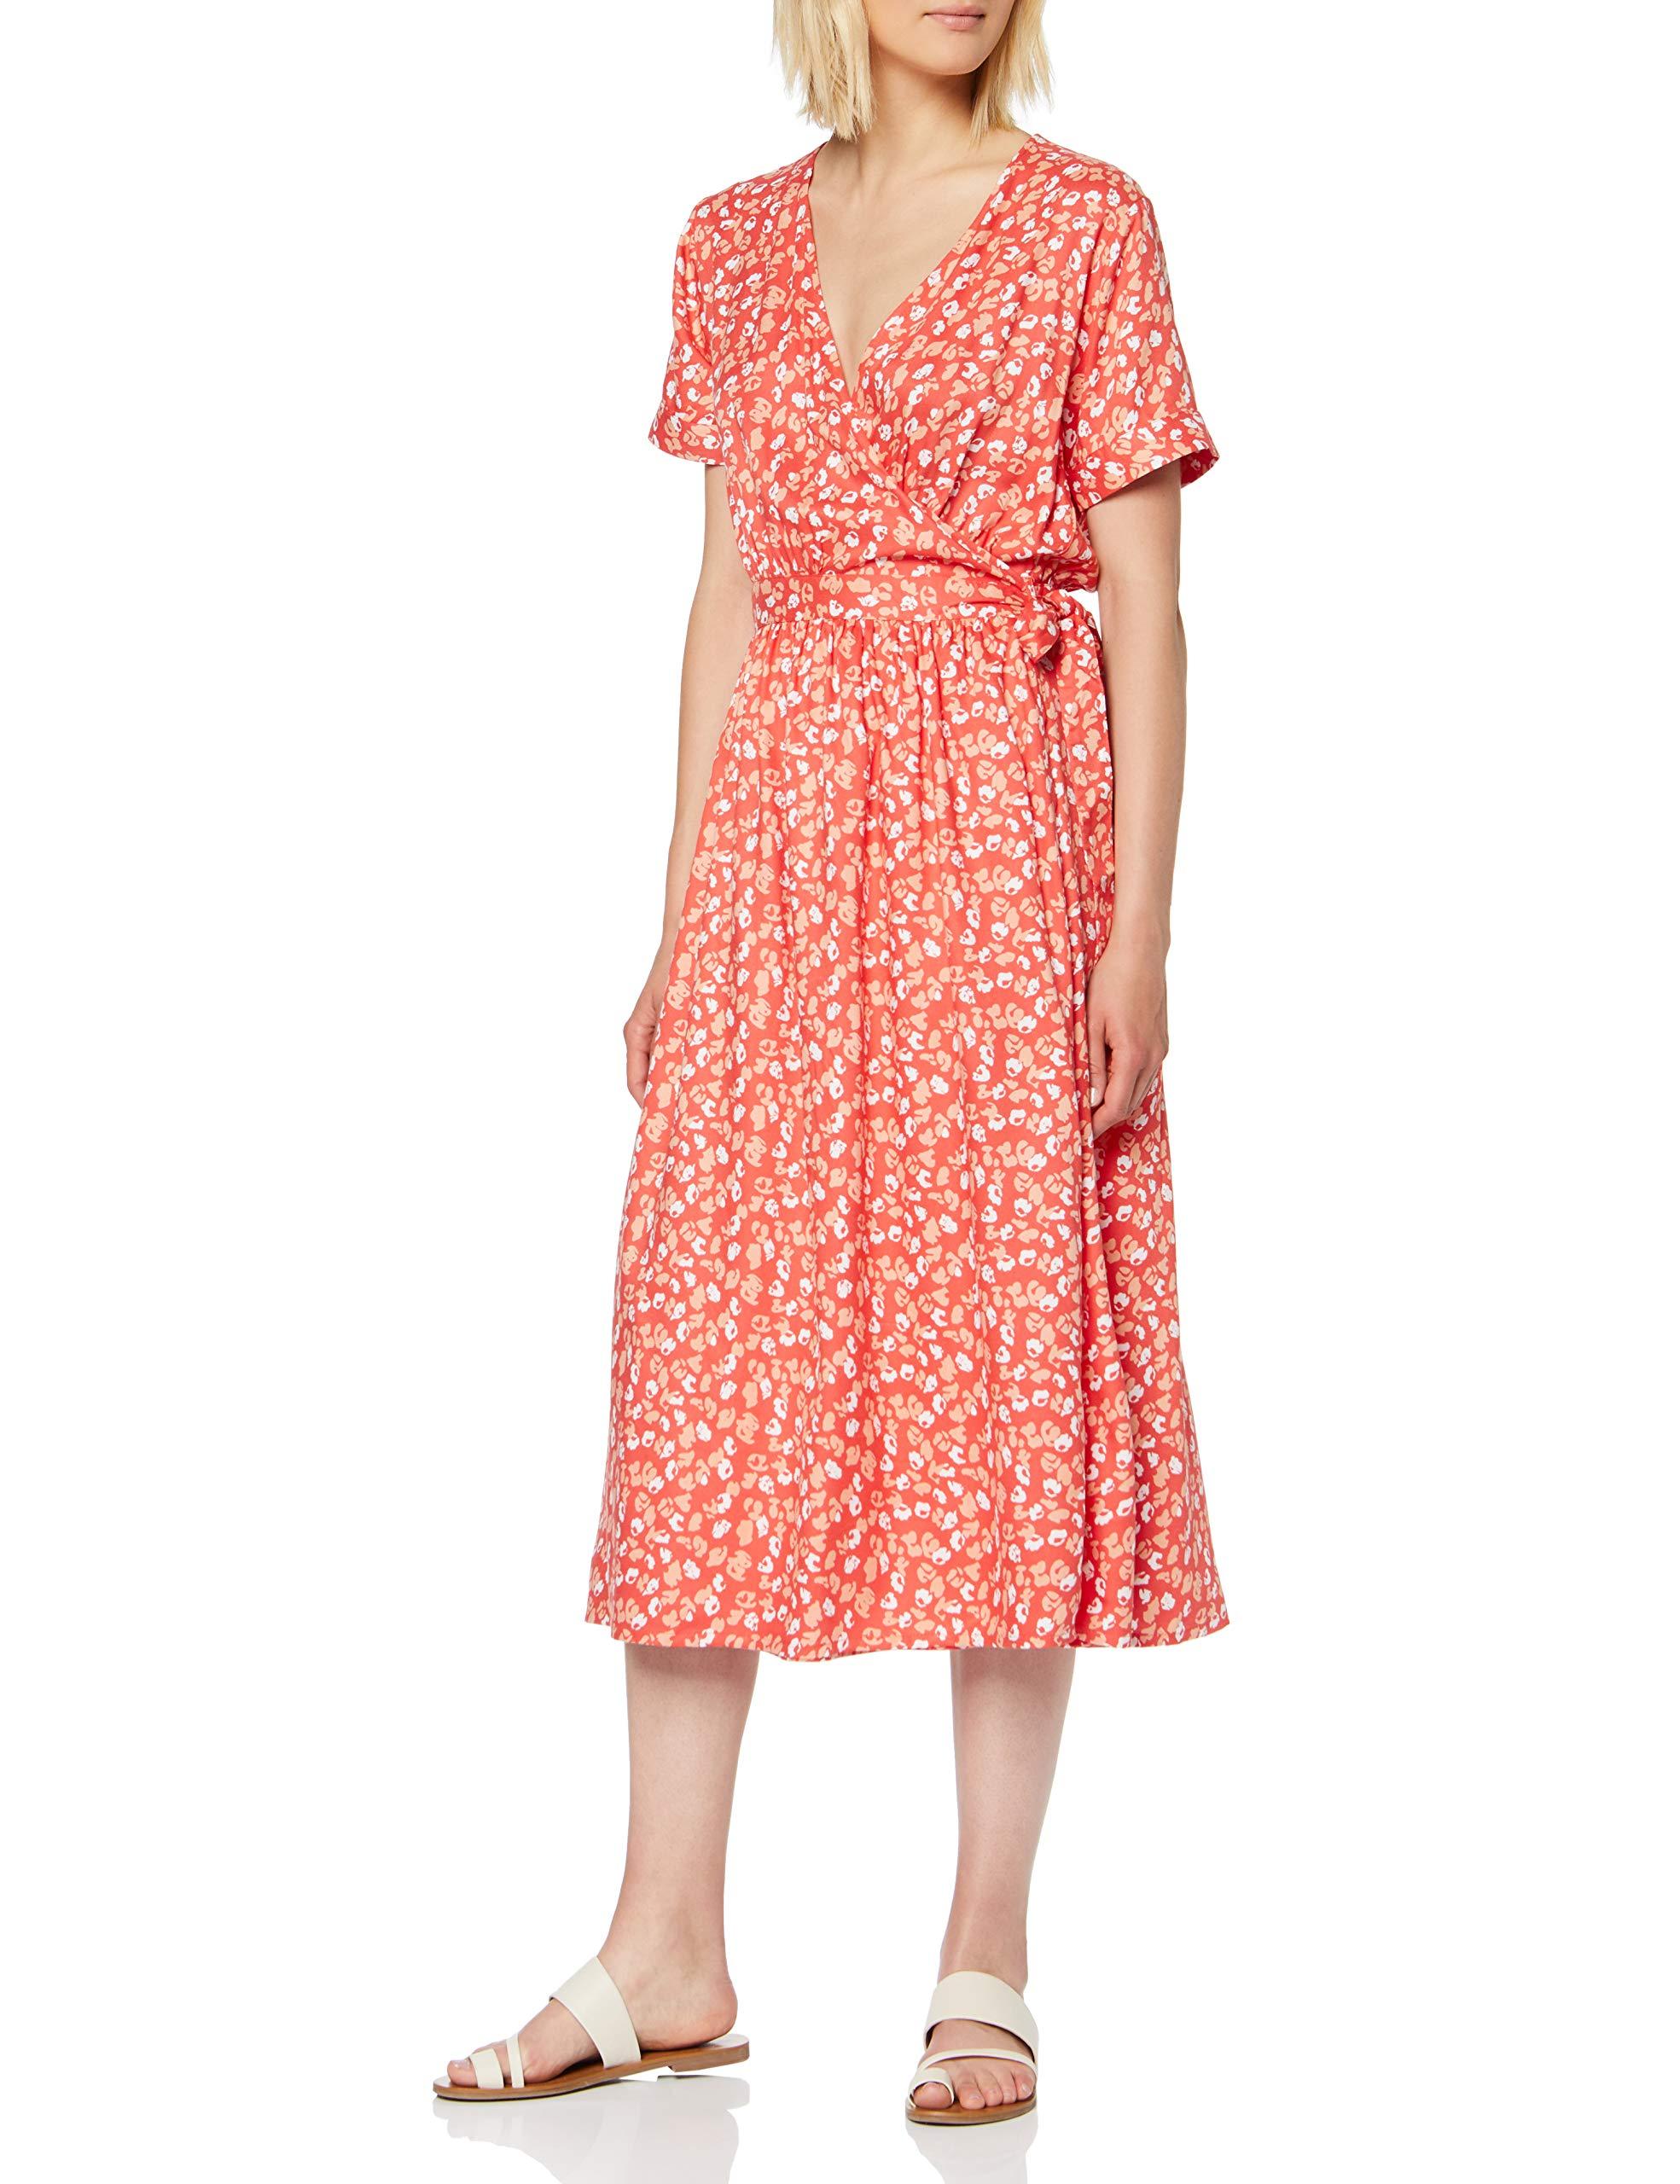 Vivette RobeRougesunset Sparkz Copenhagen Wrap Red 54538taille FabricantMediumFemme Dress 1cFKTlJ